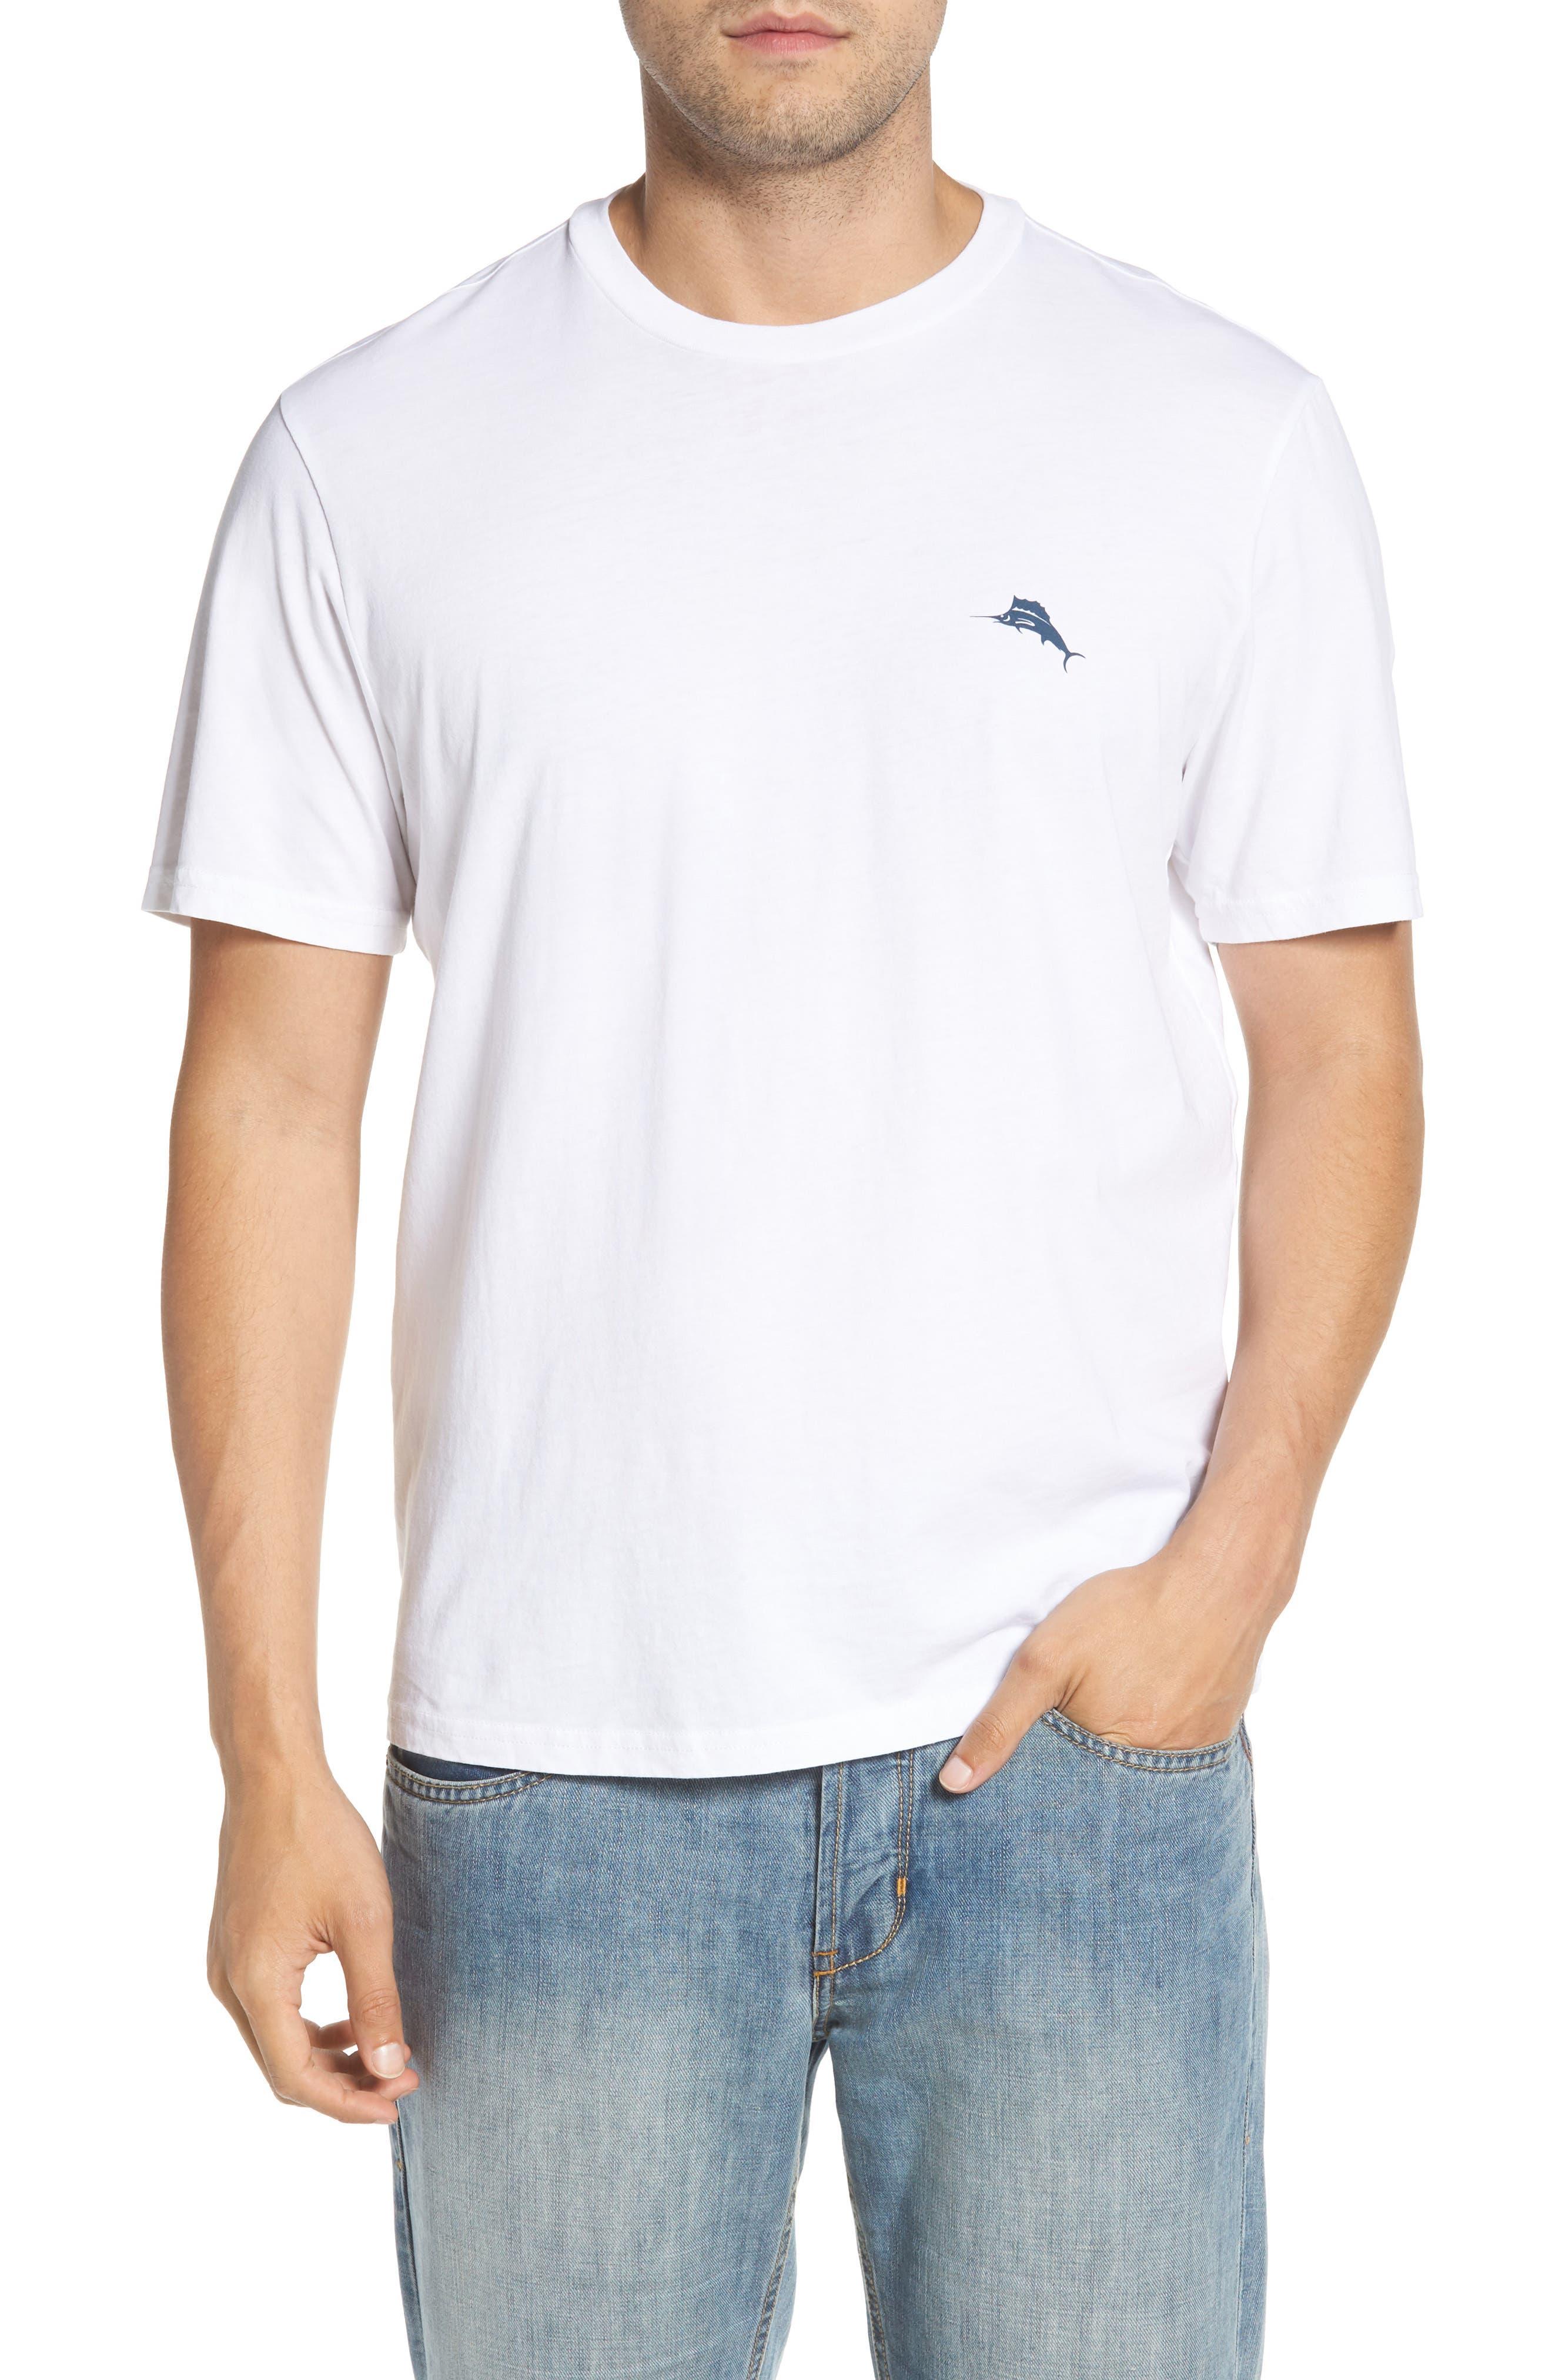 Diamond Cove T-Shirt,                         Main,                         color, White